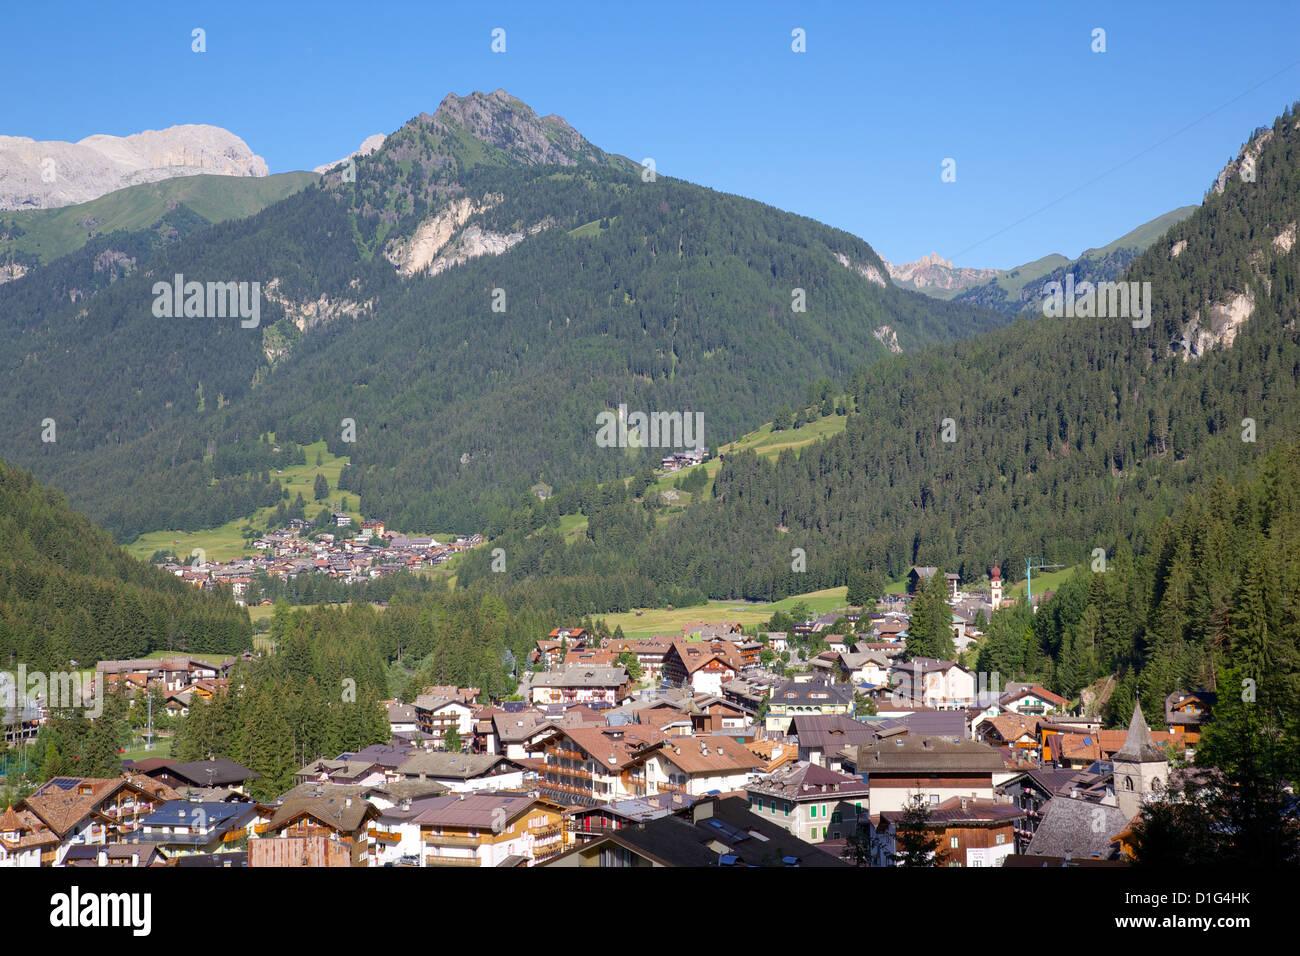 View over town, Canazei, Trentino-Alto Adige, Italy, Europe - Stock Image